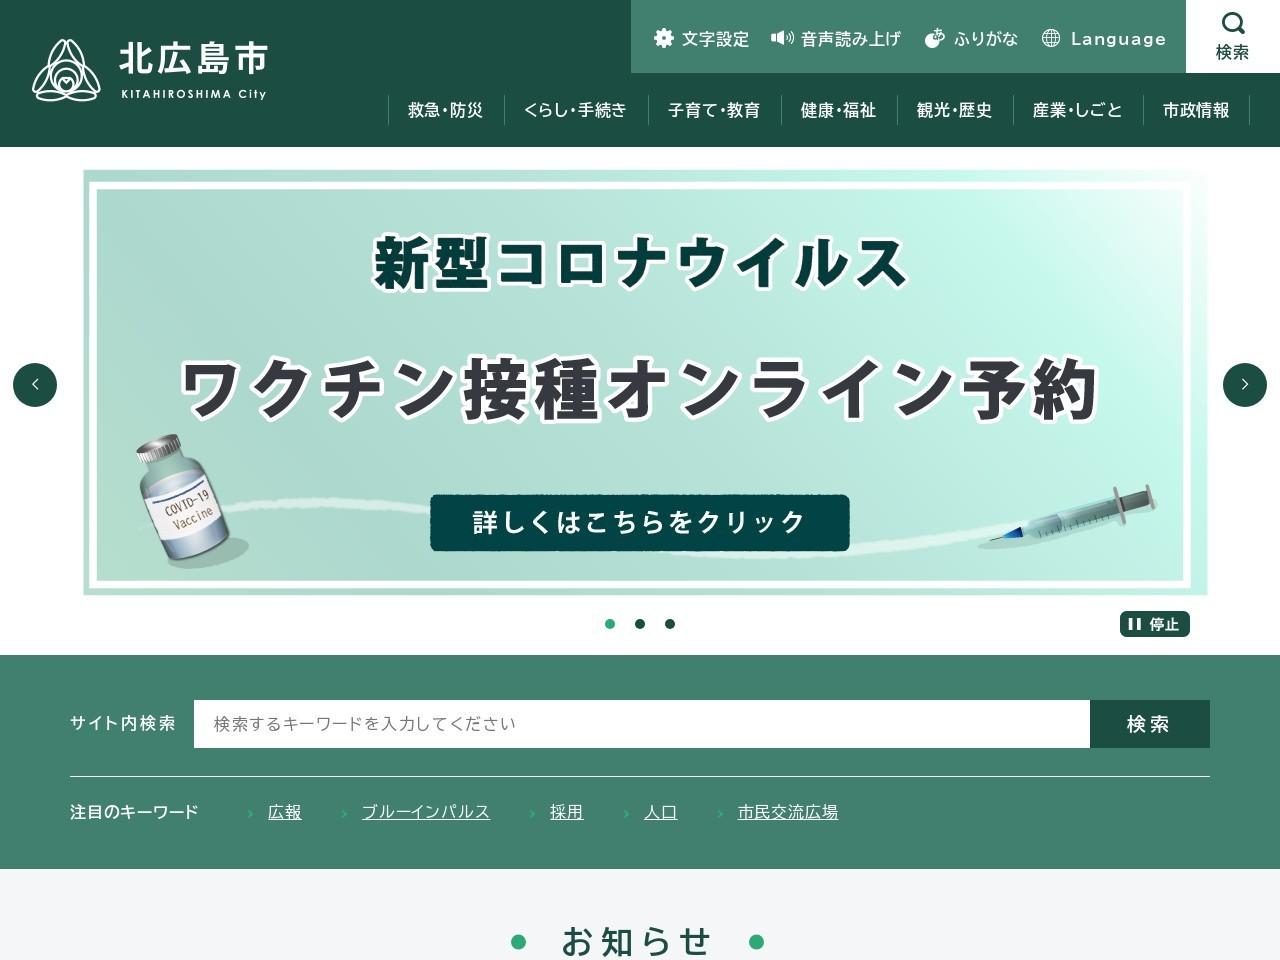 http://www.city.kitahiroshima.hokkaido.jp/hotnews/detail/00130401.html